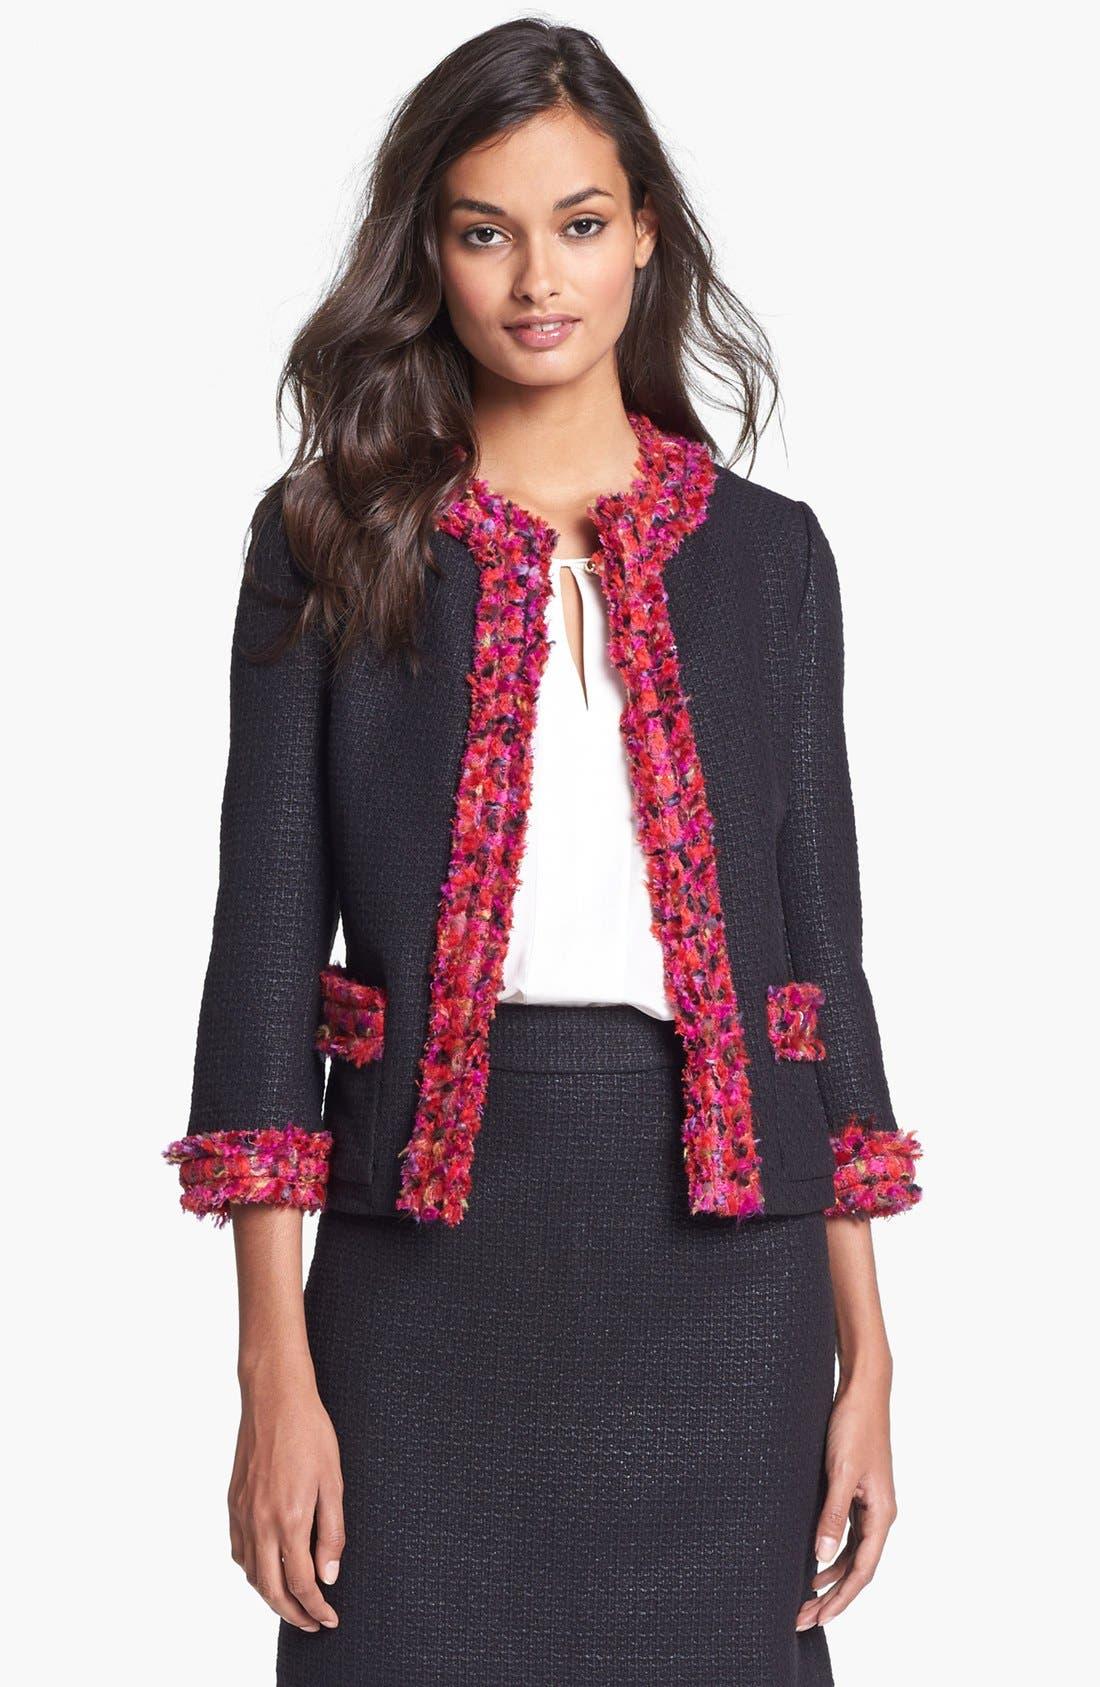 Alternate Image 1 Selected - kate spade new york 'ginnifer' woven jacket